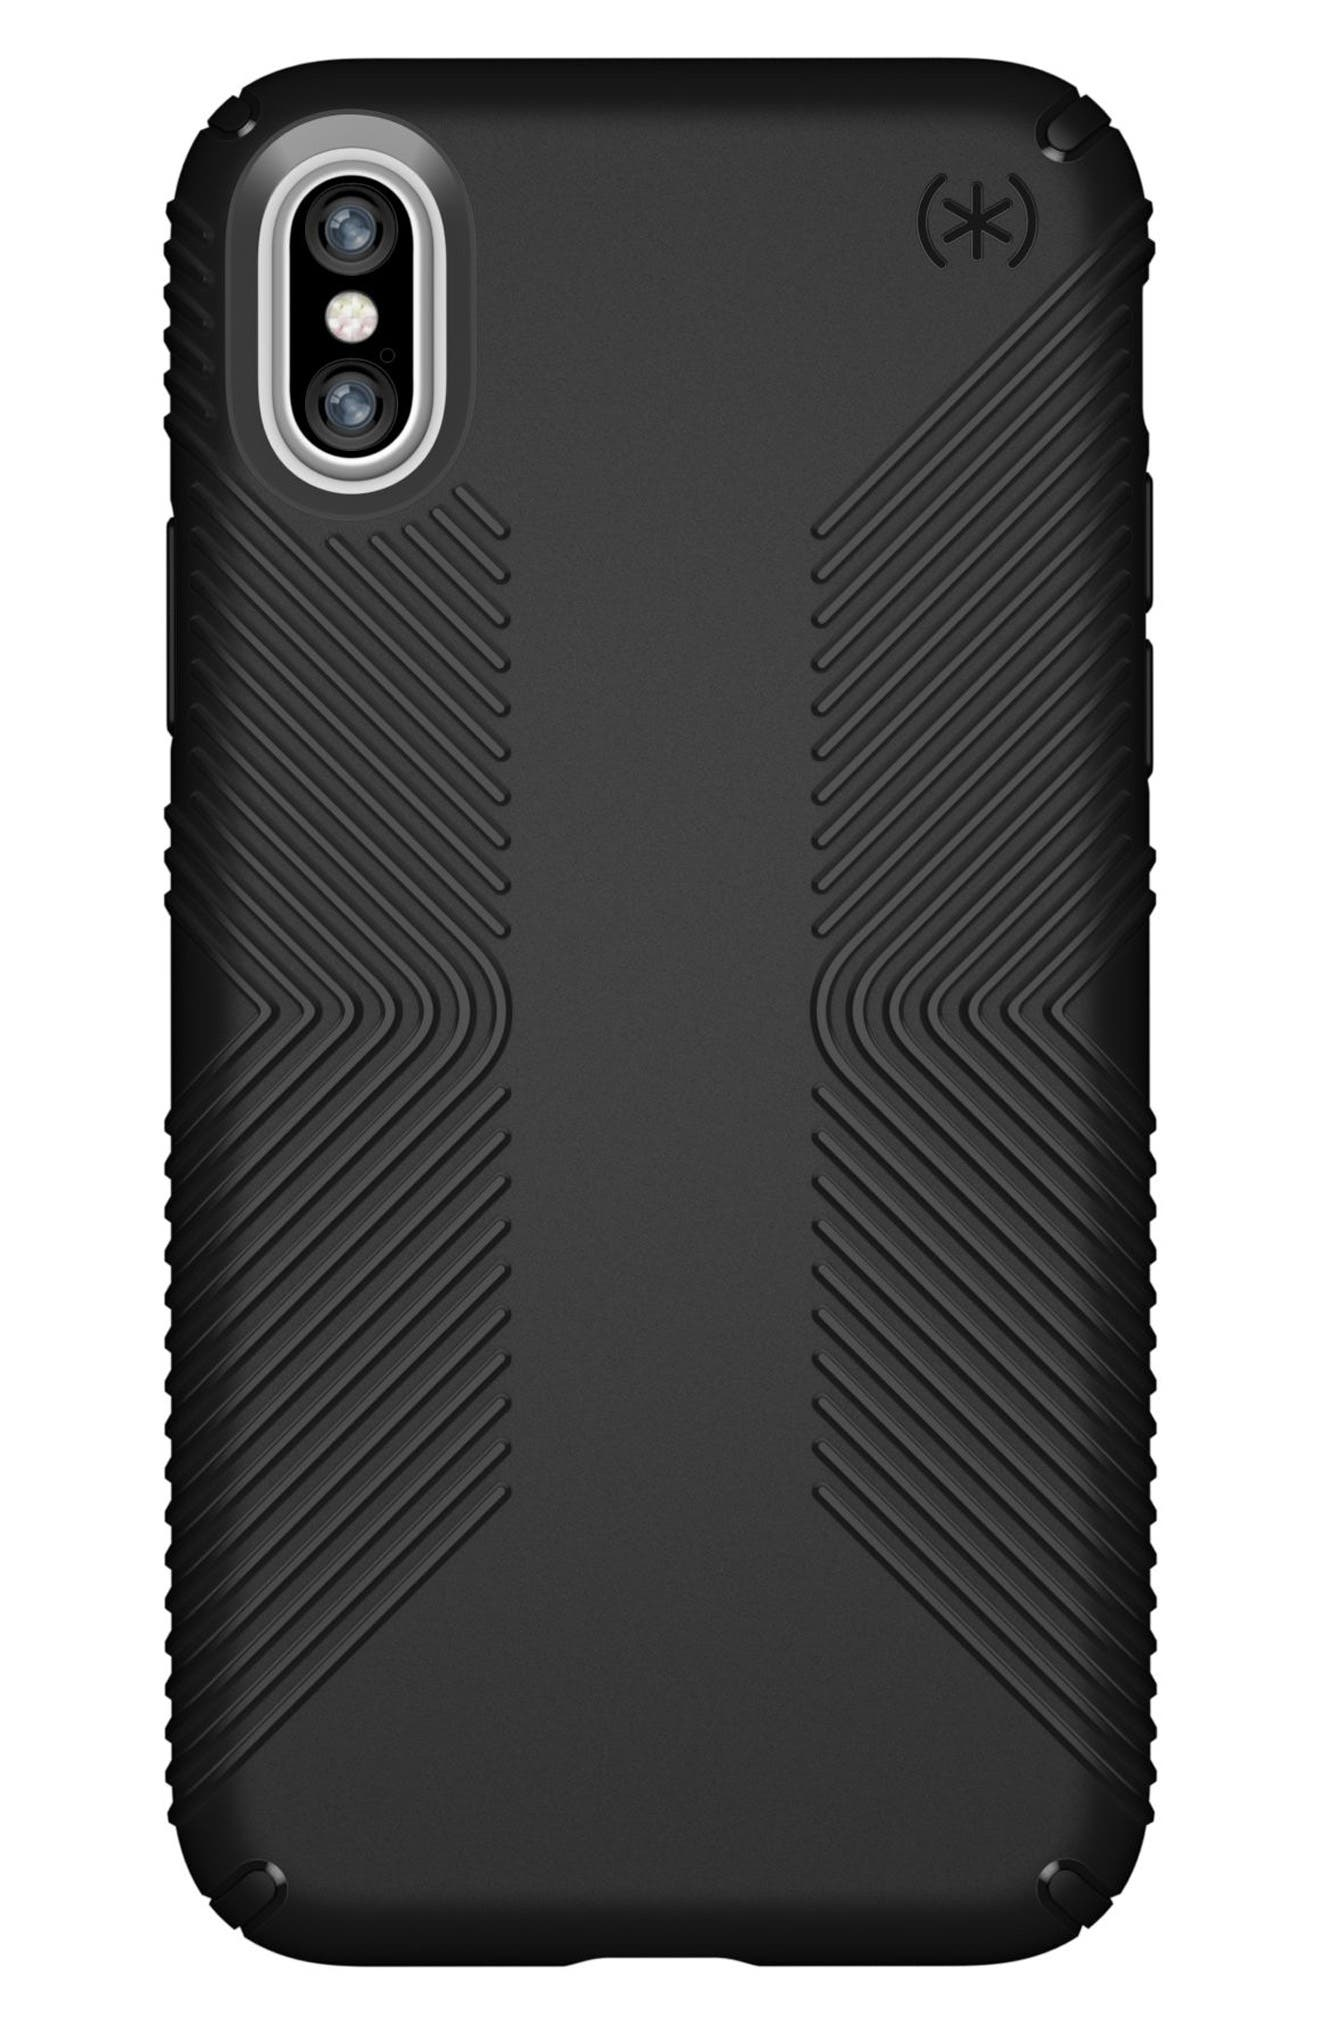 iPhone X Case,                             Main thumbnail 1, color,                             Black/ Black